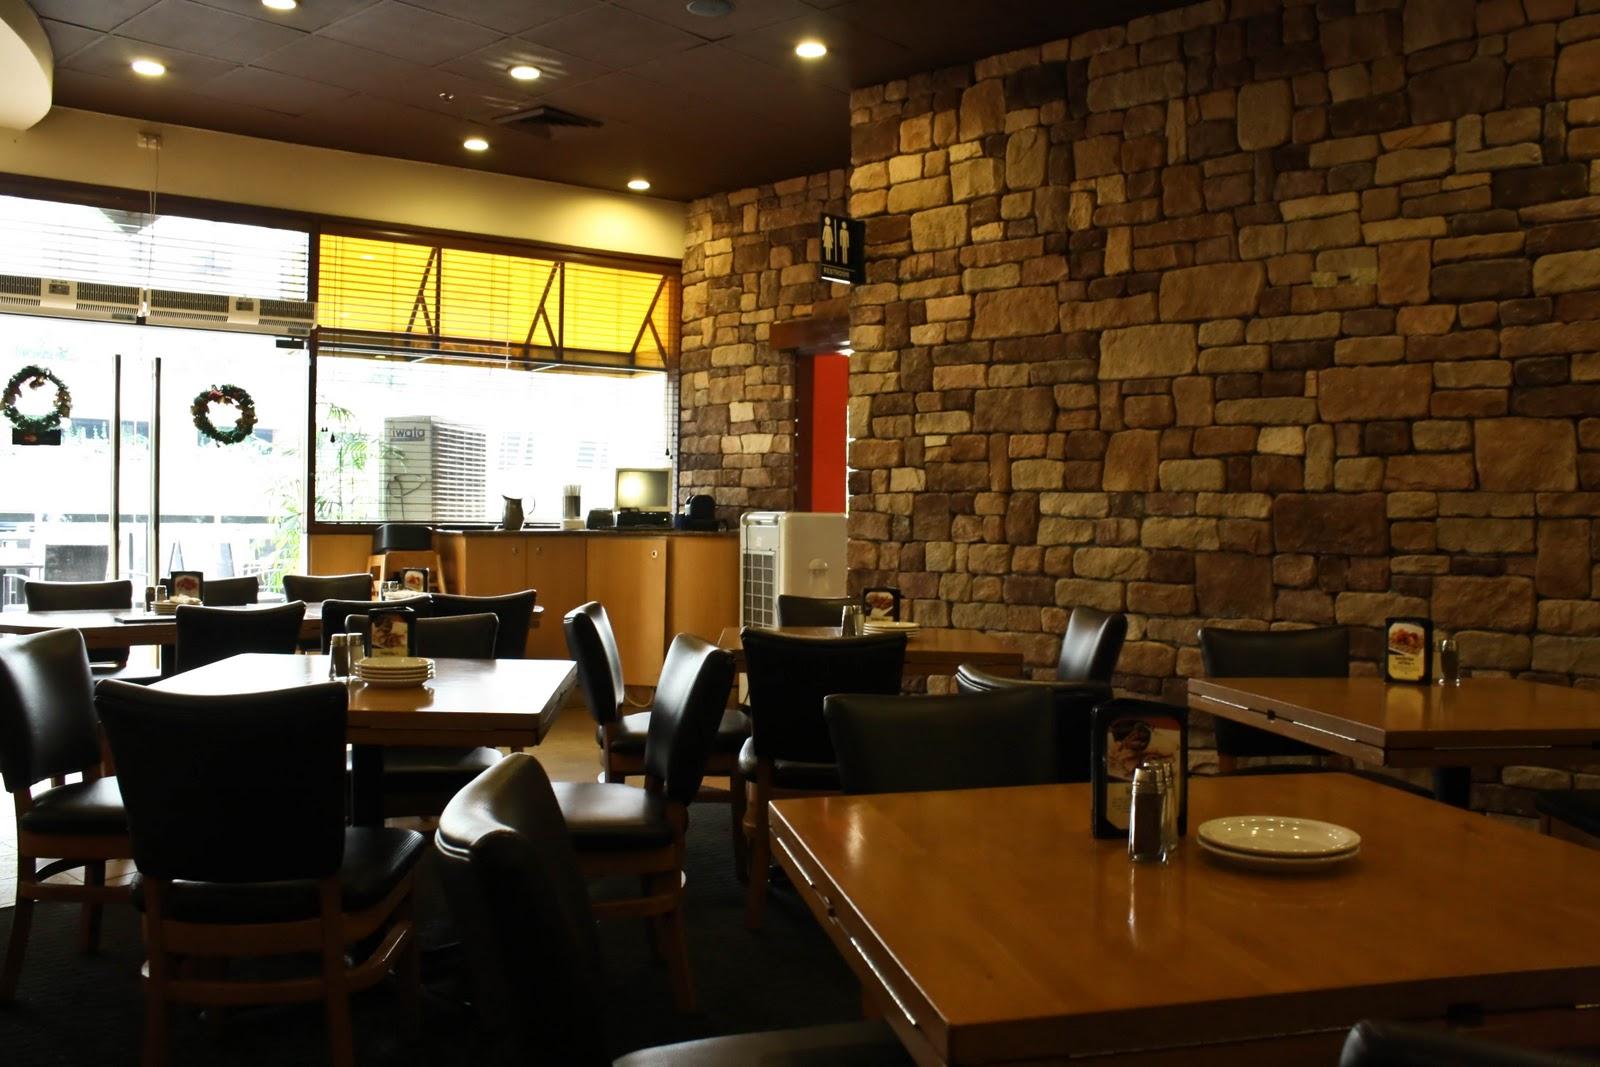 California Pizza Kitchen Greenbelt 5 Tipidobo